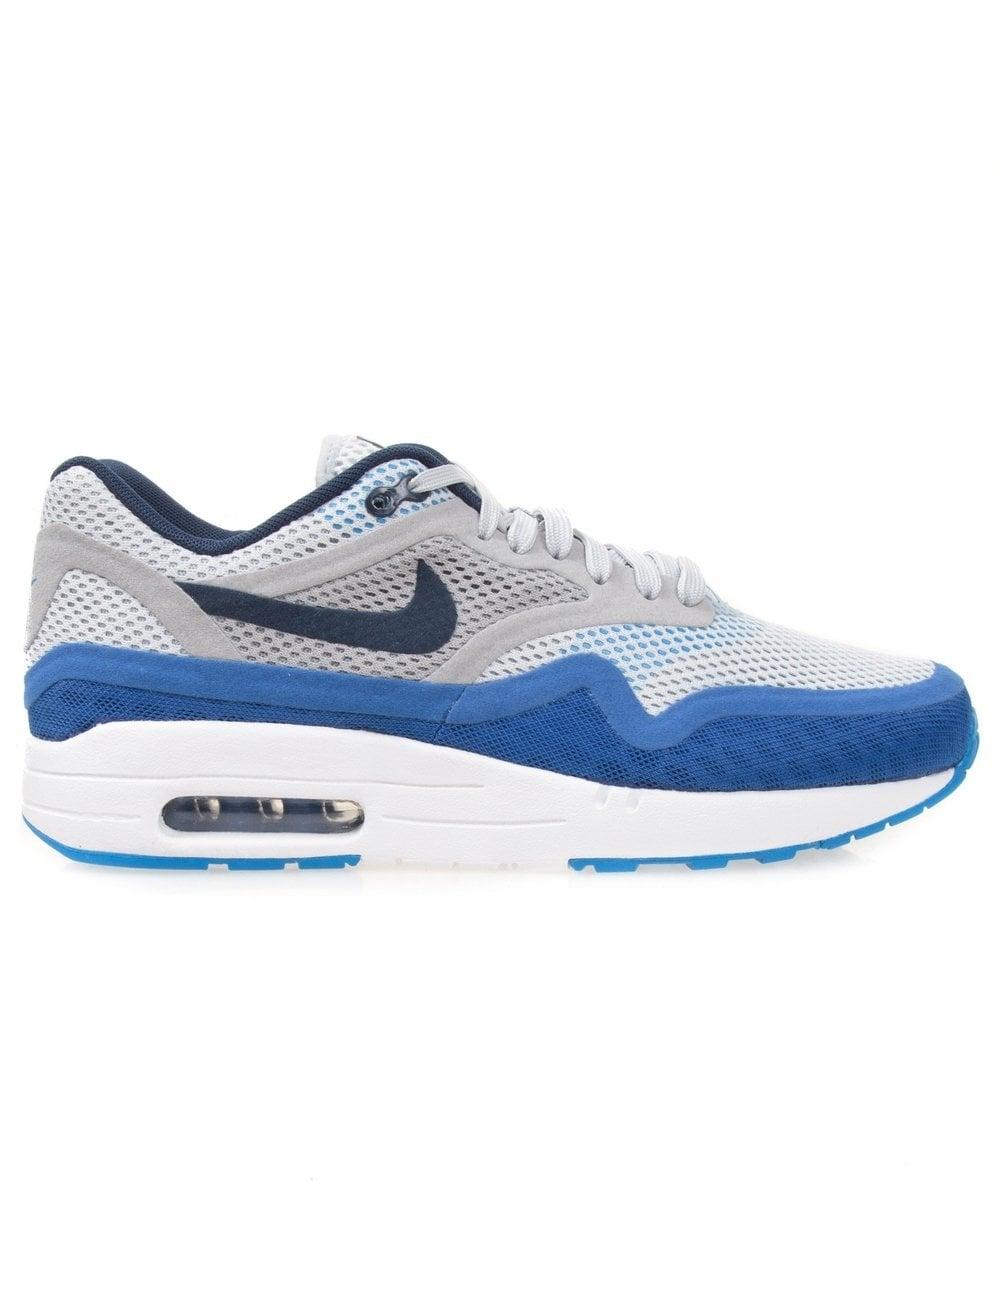 63bc89da54fe Nike Air Max 1 Breathe - White Mid Navy - Footwear from Fat Buddha ...